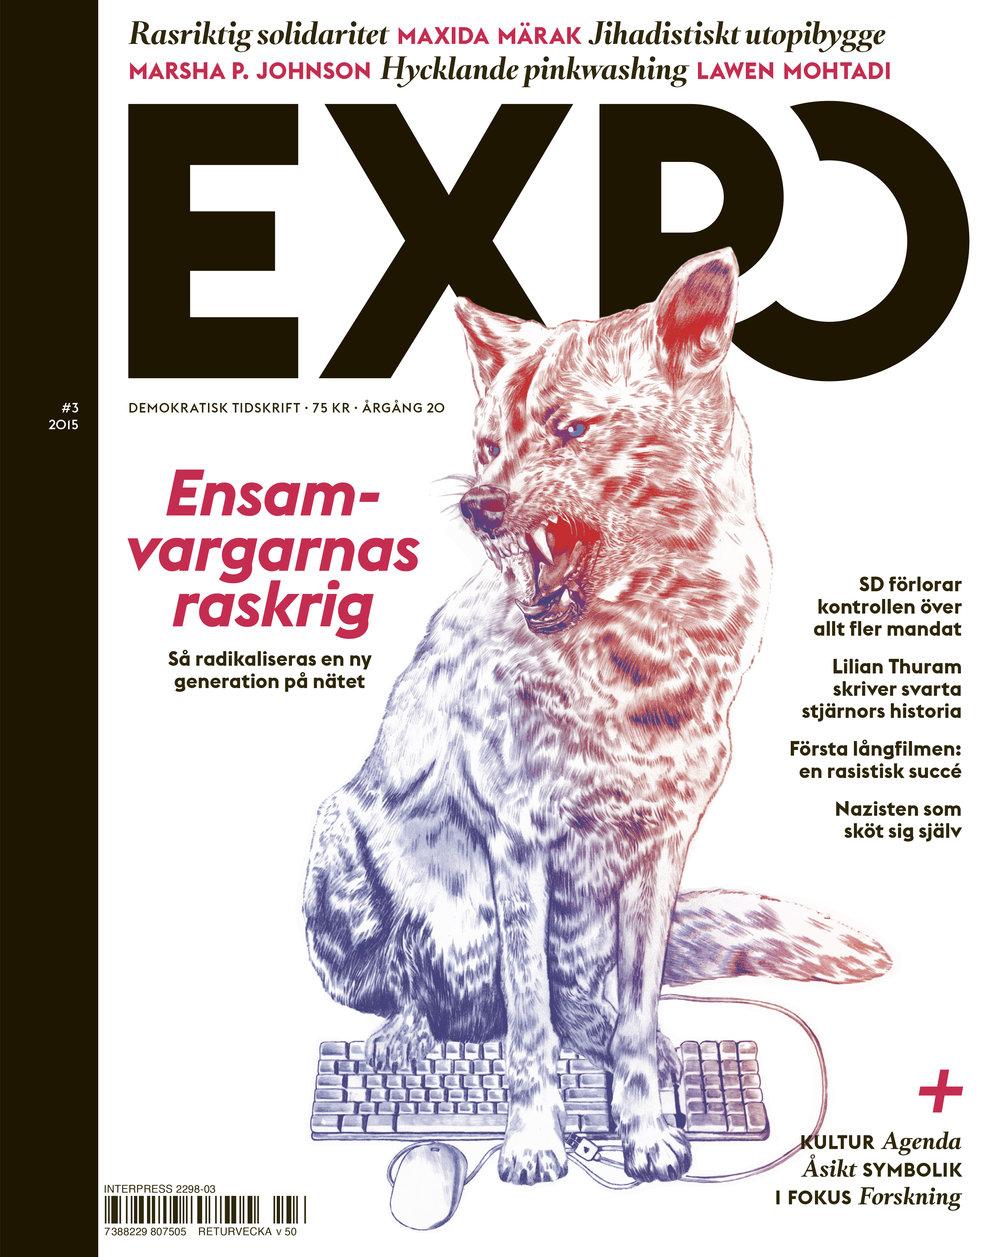 Expo #3-2015  Art direction and graphic design. Illustration: Beata Boucht.